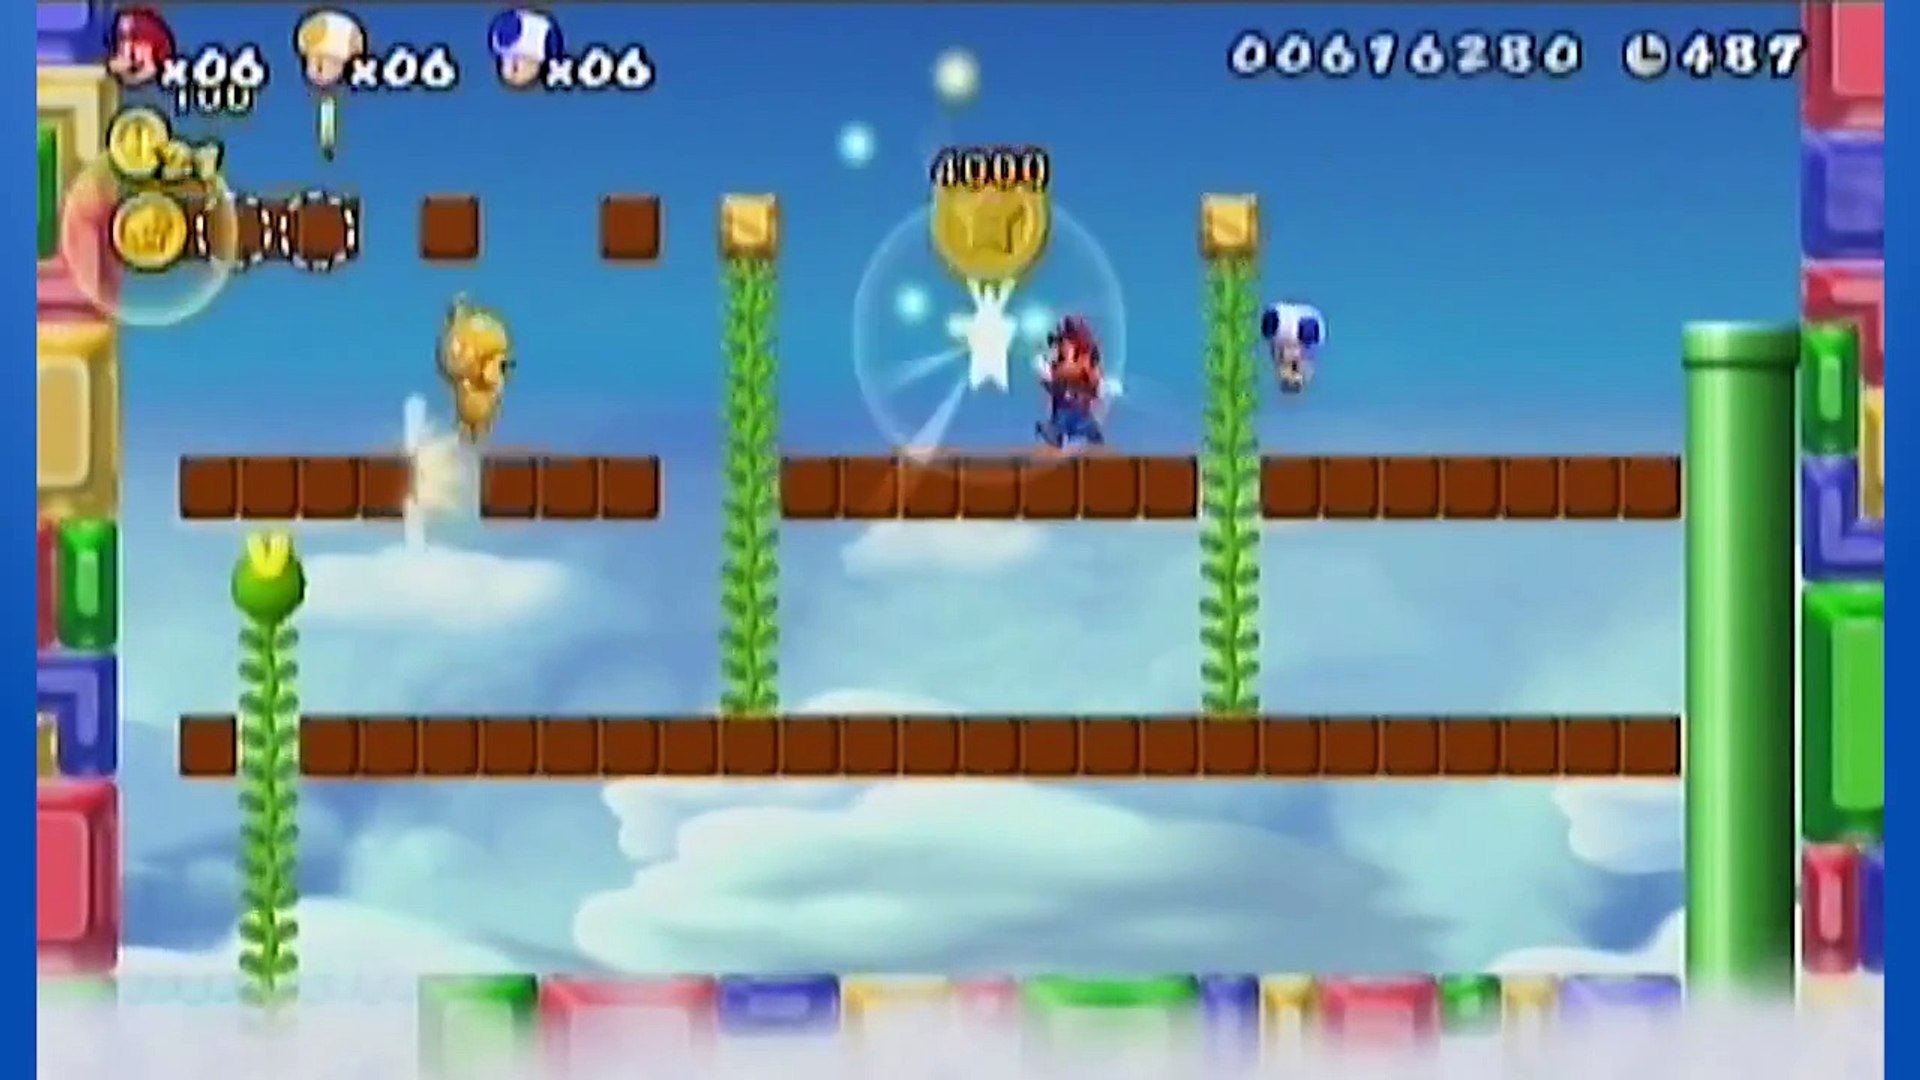 Super Mario Bros. Wii: Free Money! - Part 7 - Triple Force